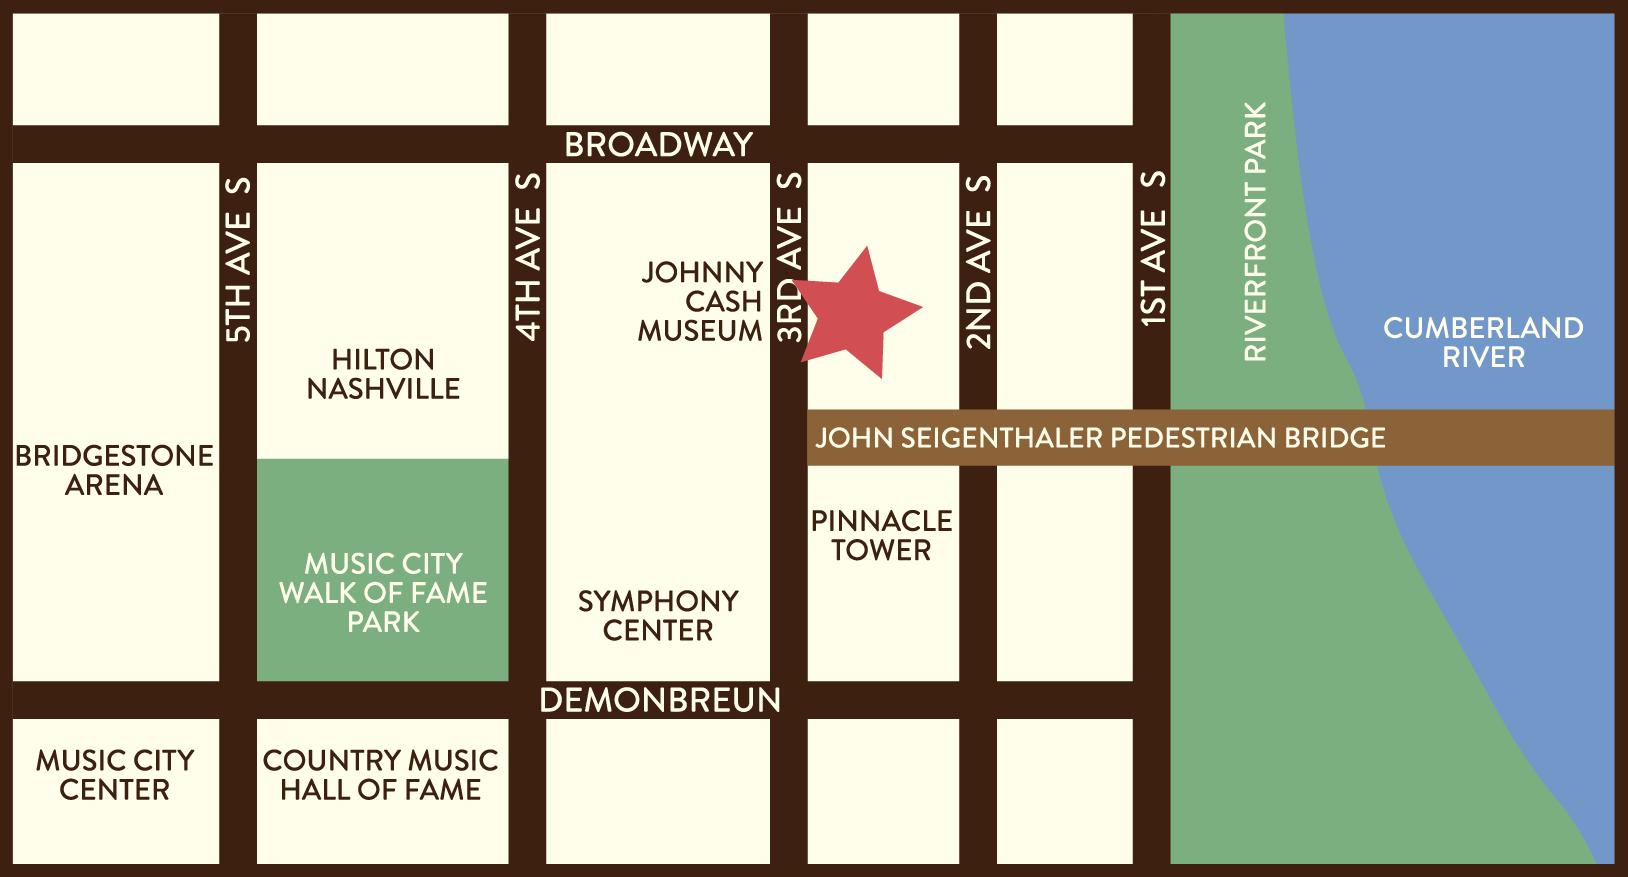 Downtown Nashville - Goo Goo Cluster on